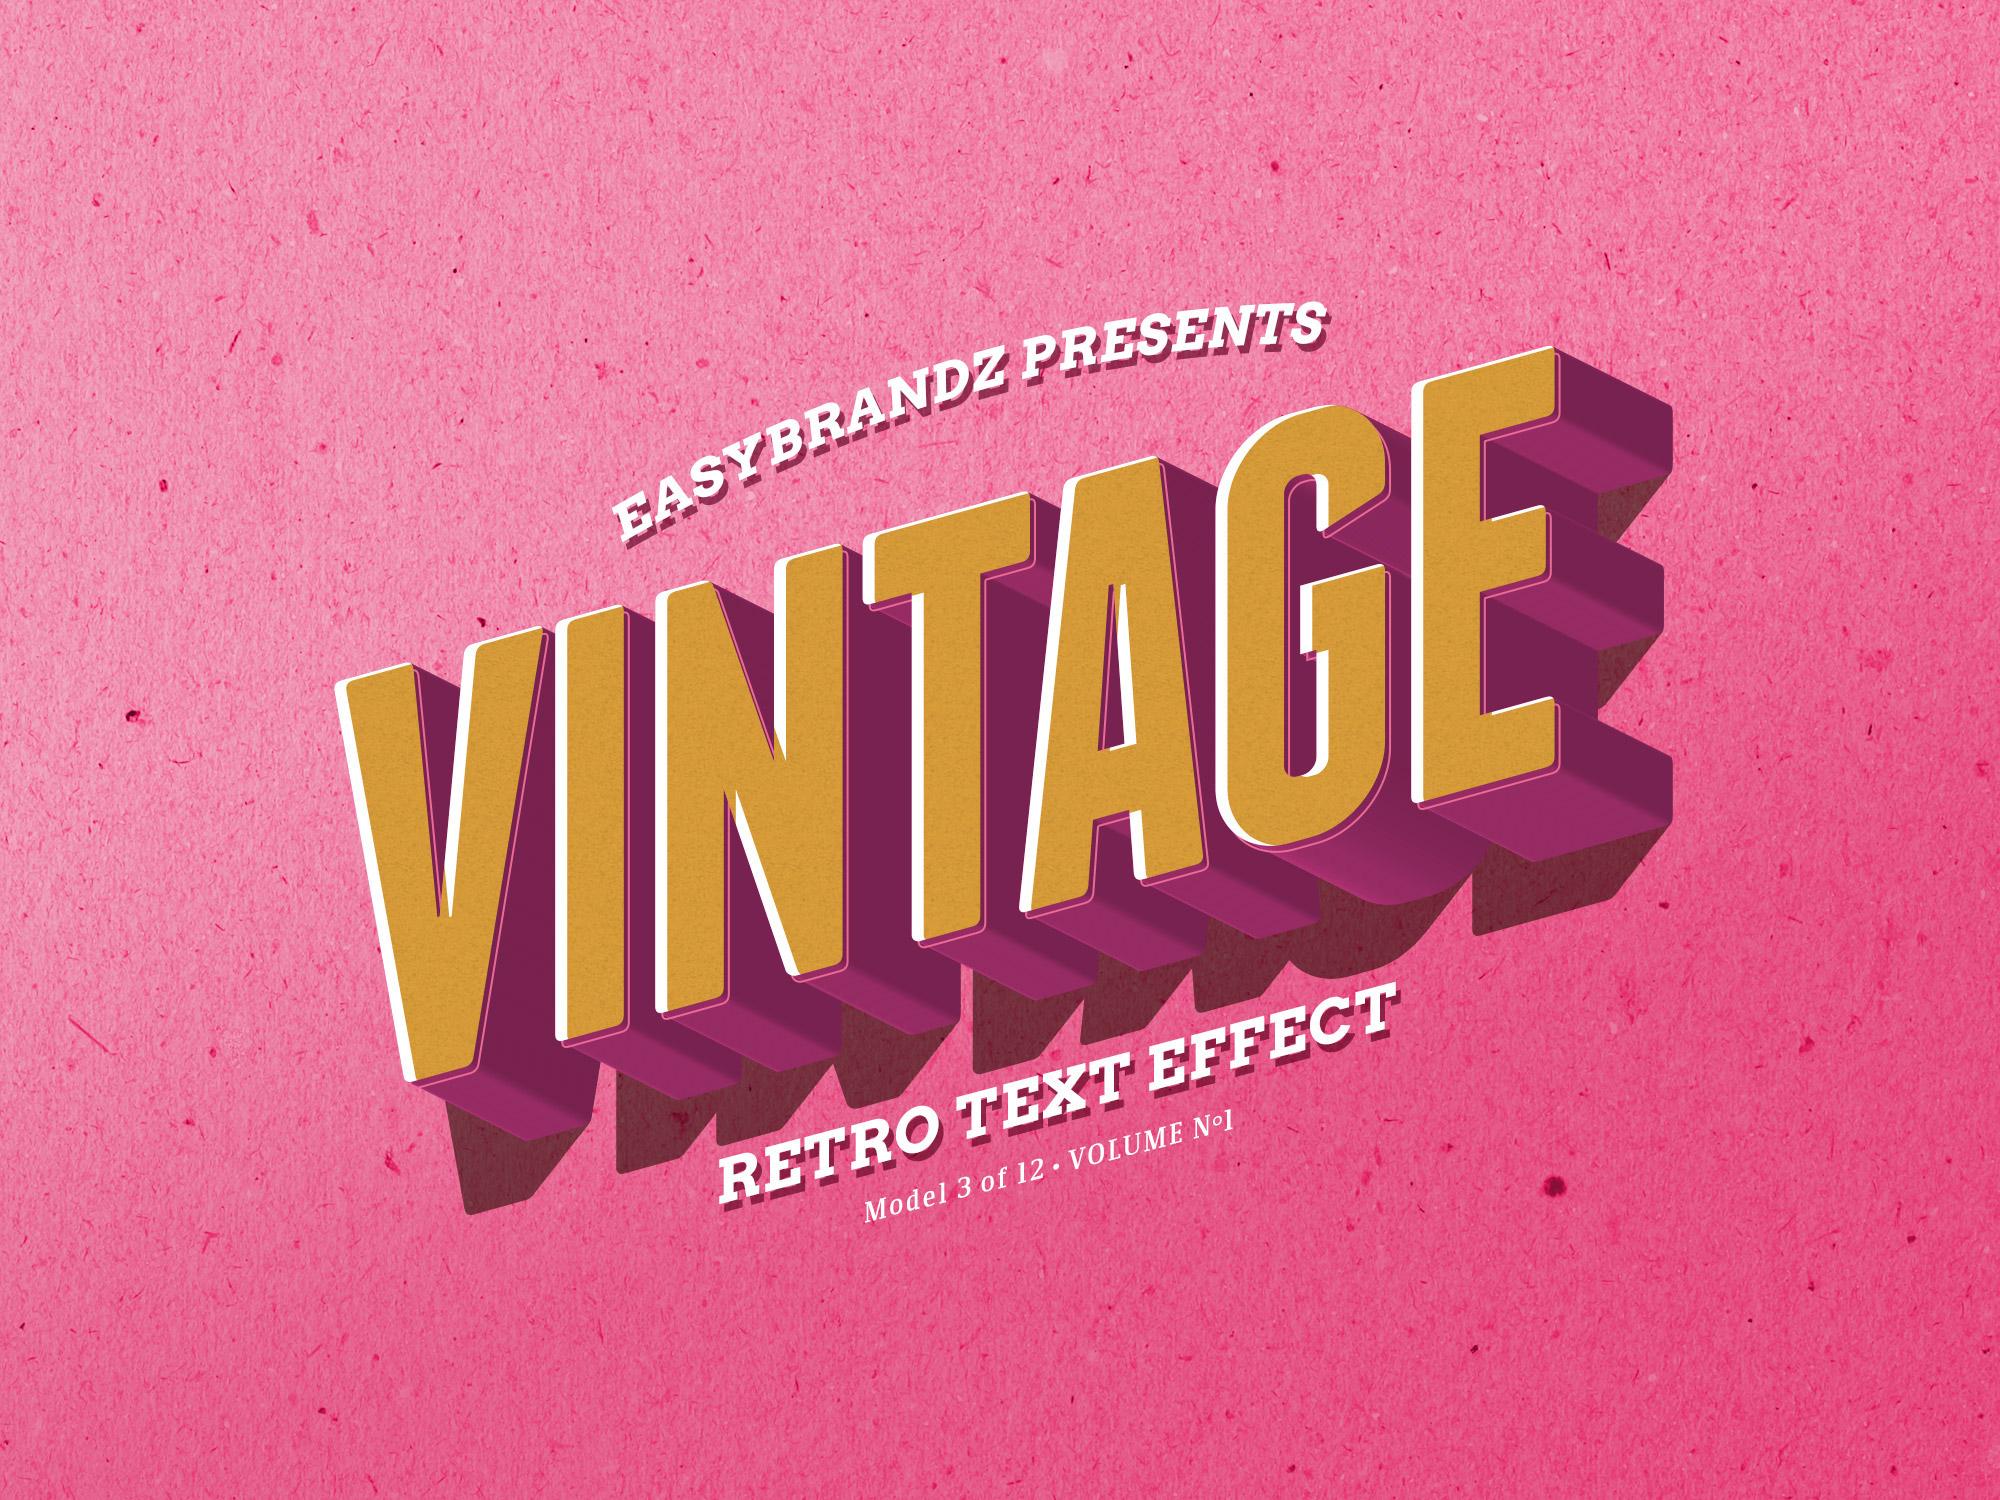 2000x1500 Retro Text Effects Vol.01 On Behance